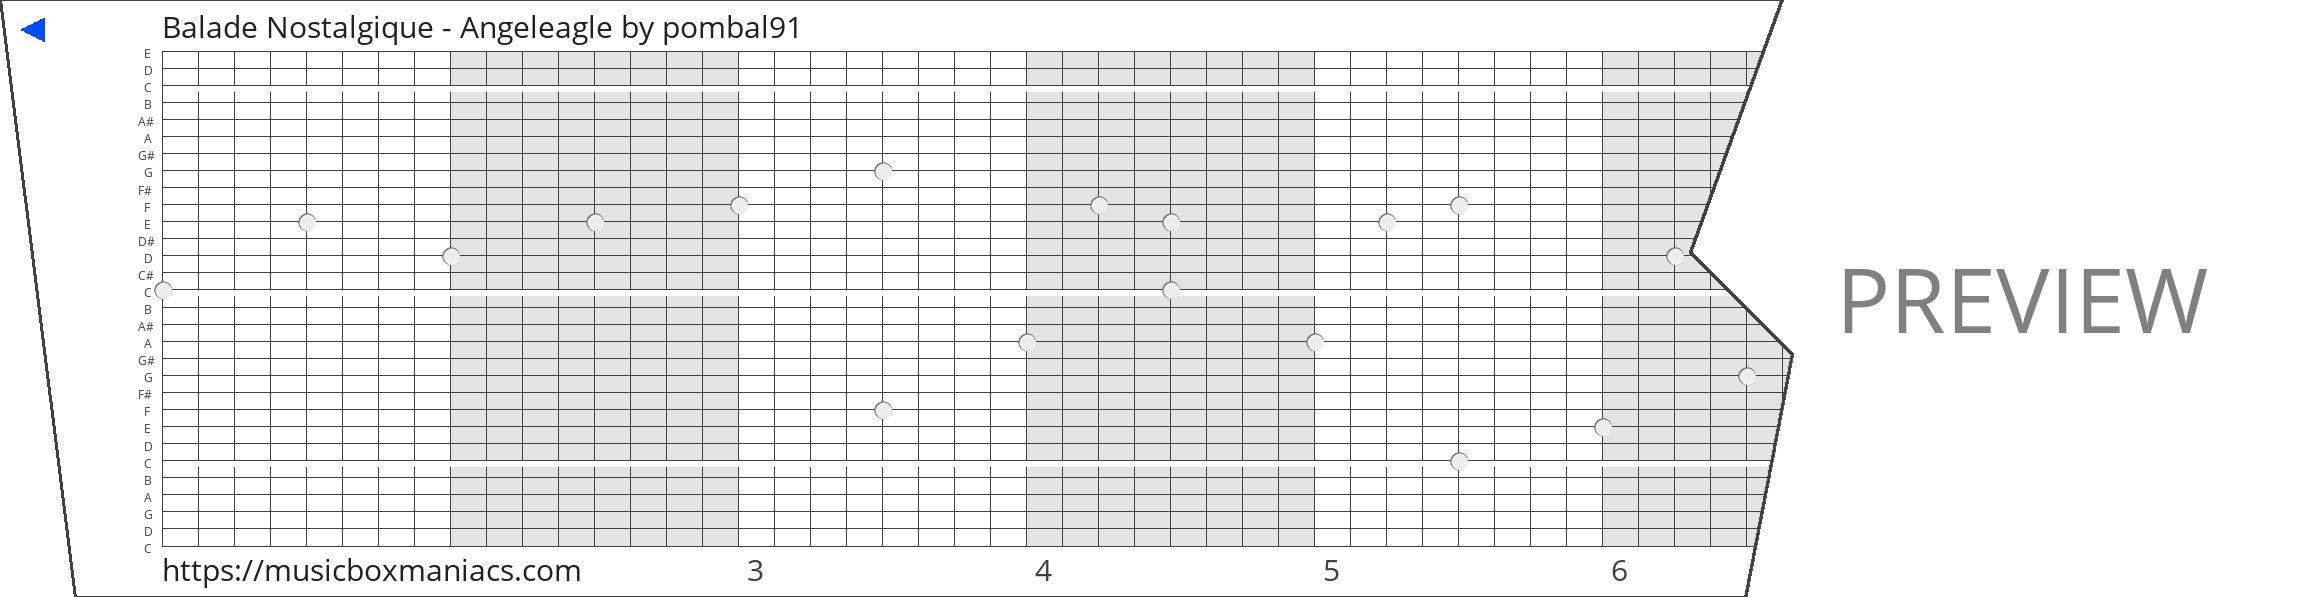 Balade Nostalgique - Angeleagle 30 note music box paper strip